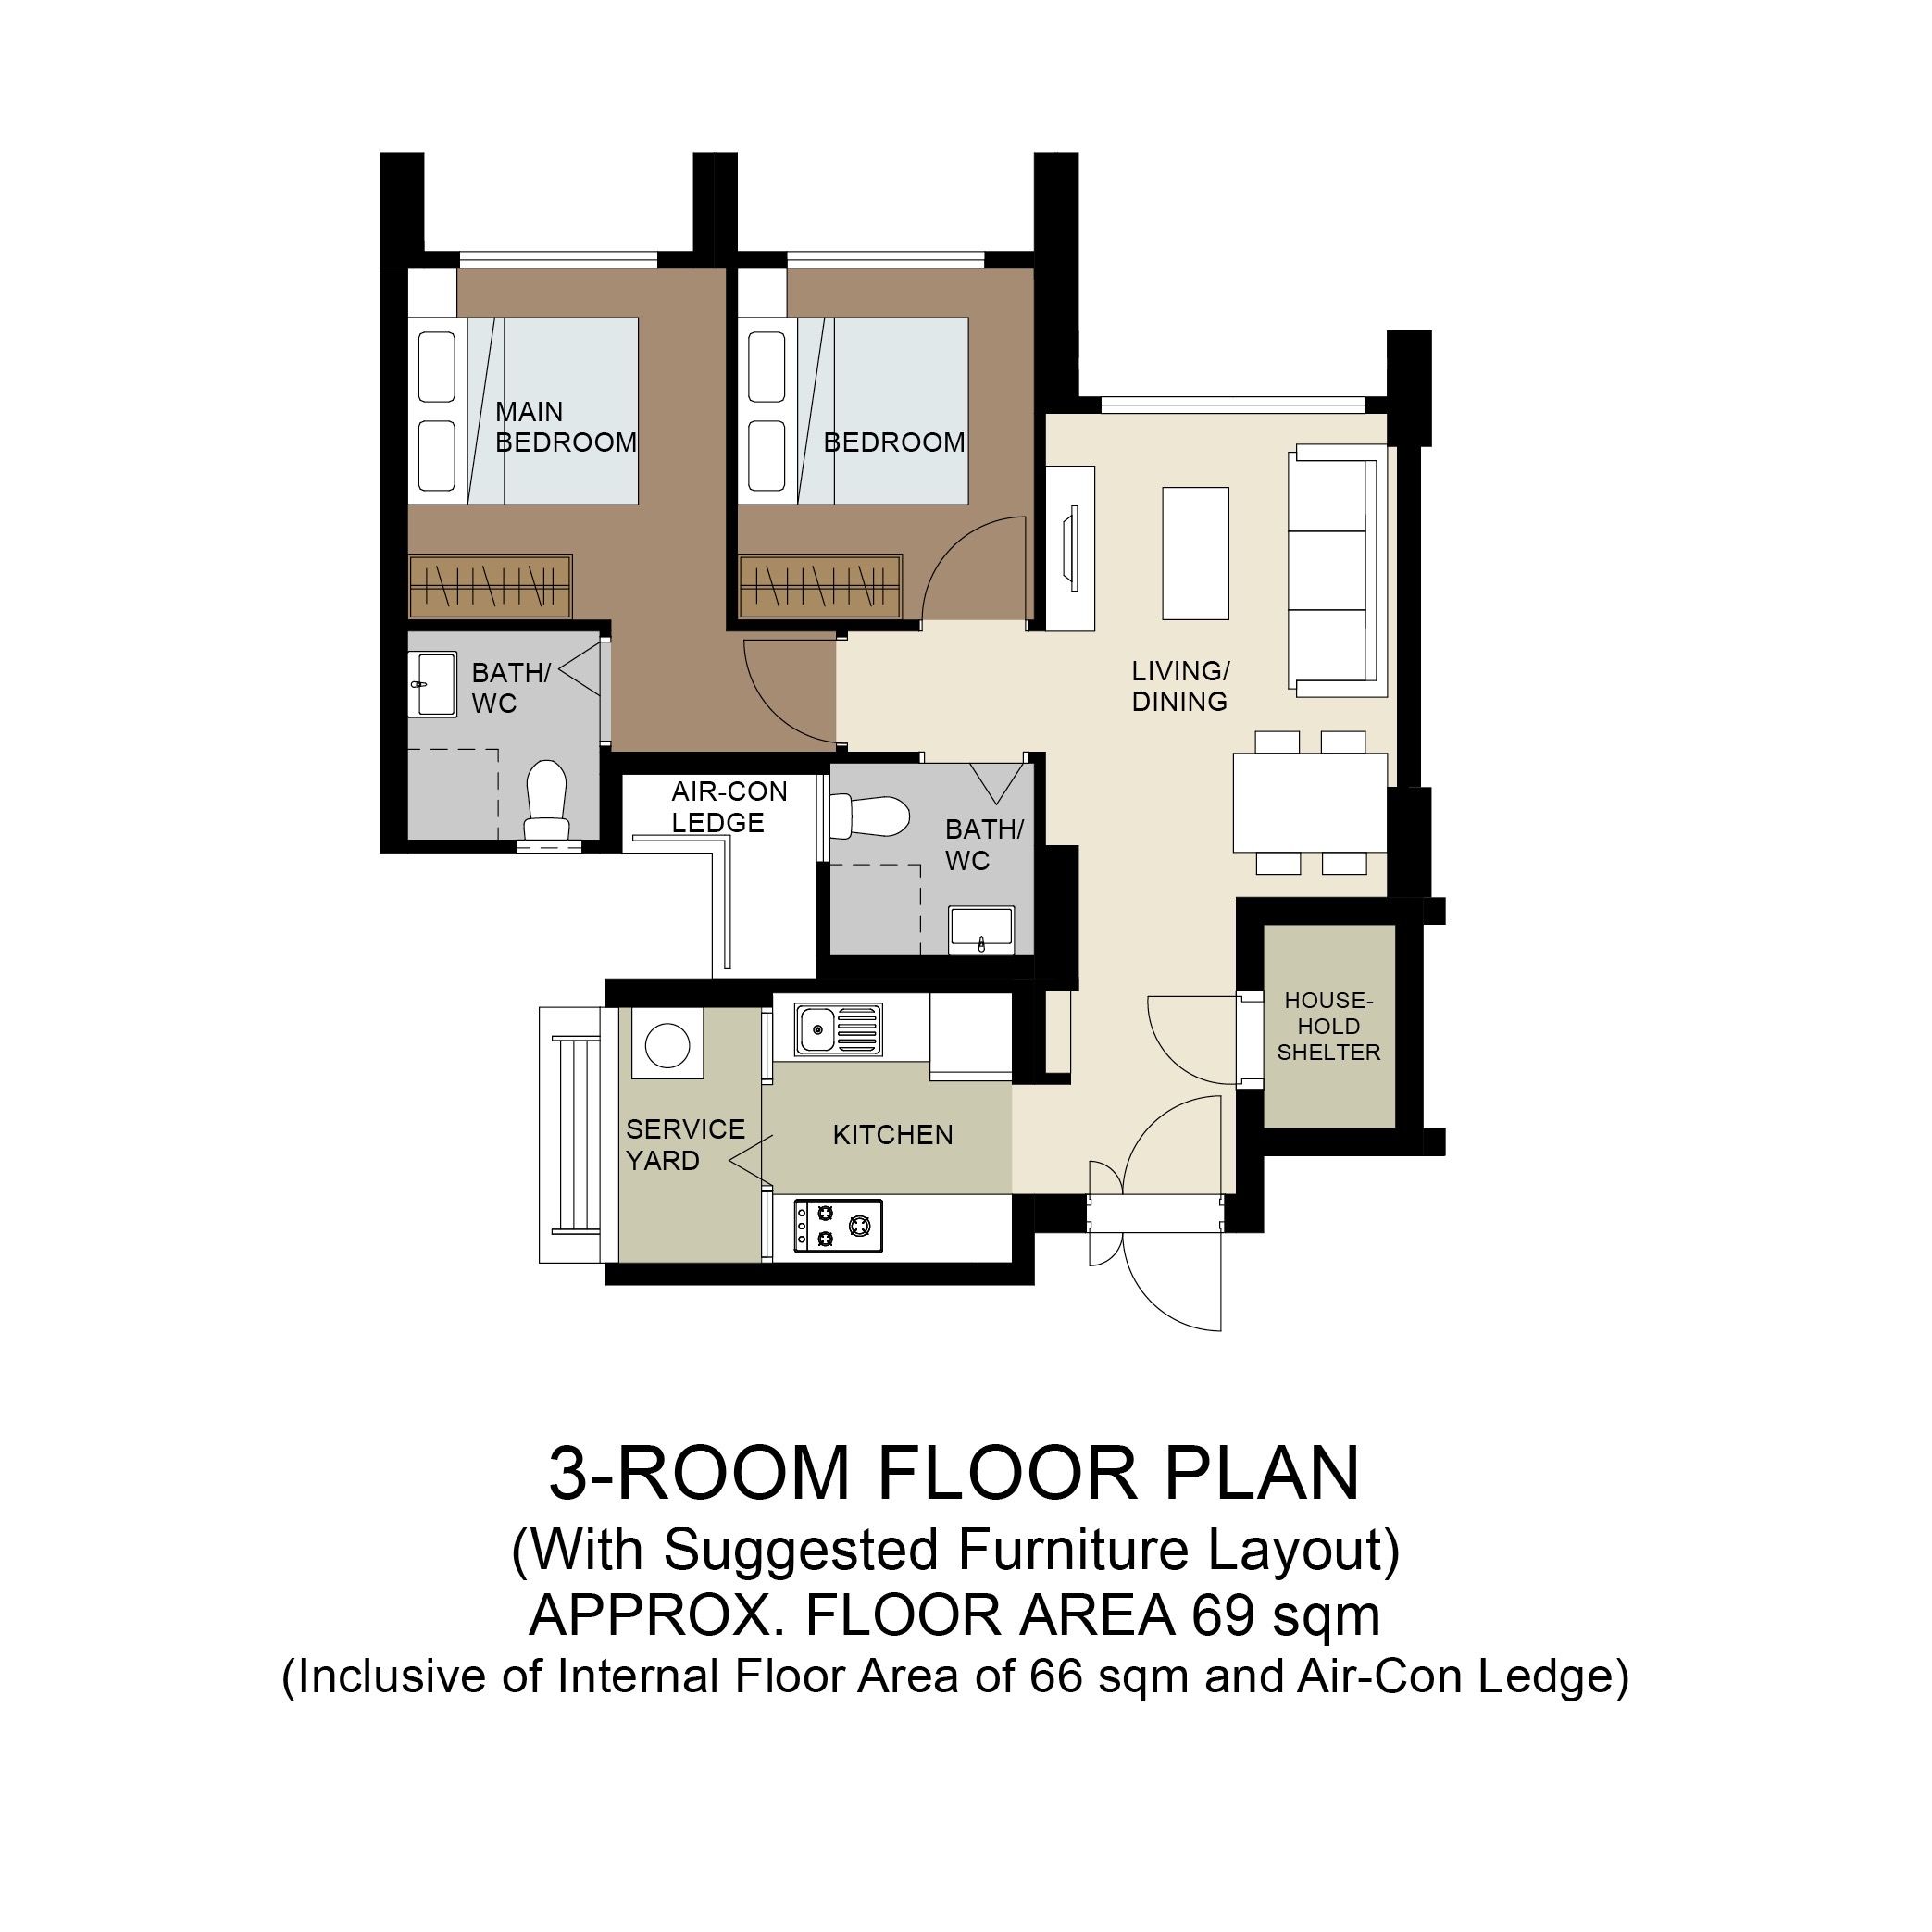 Plantation Acres Floor Plan 3-Room